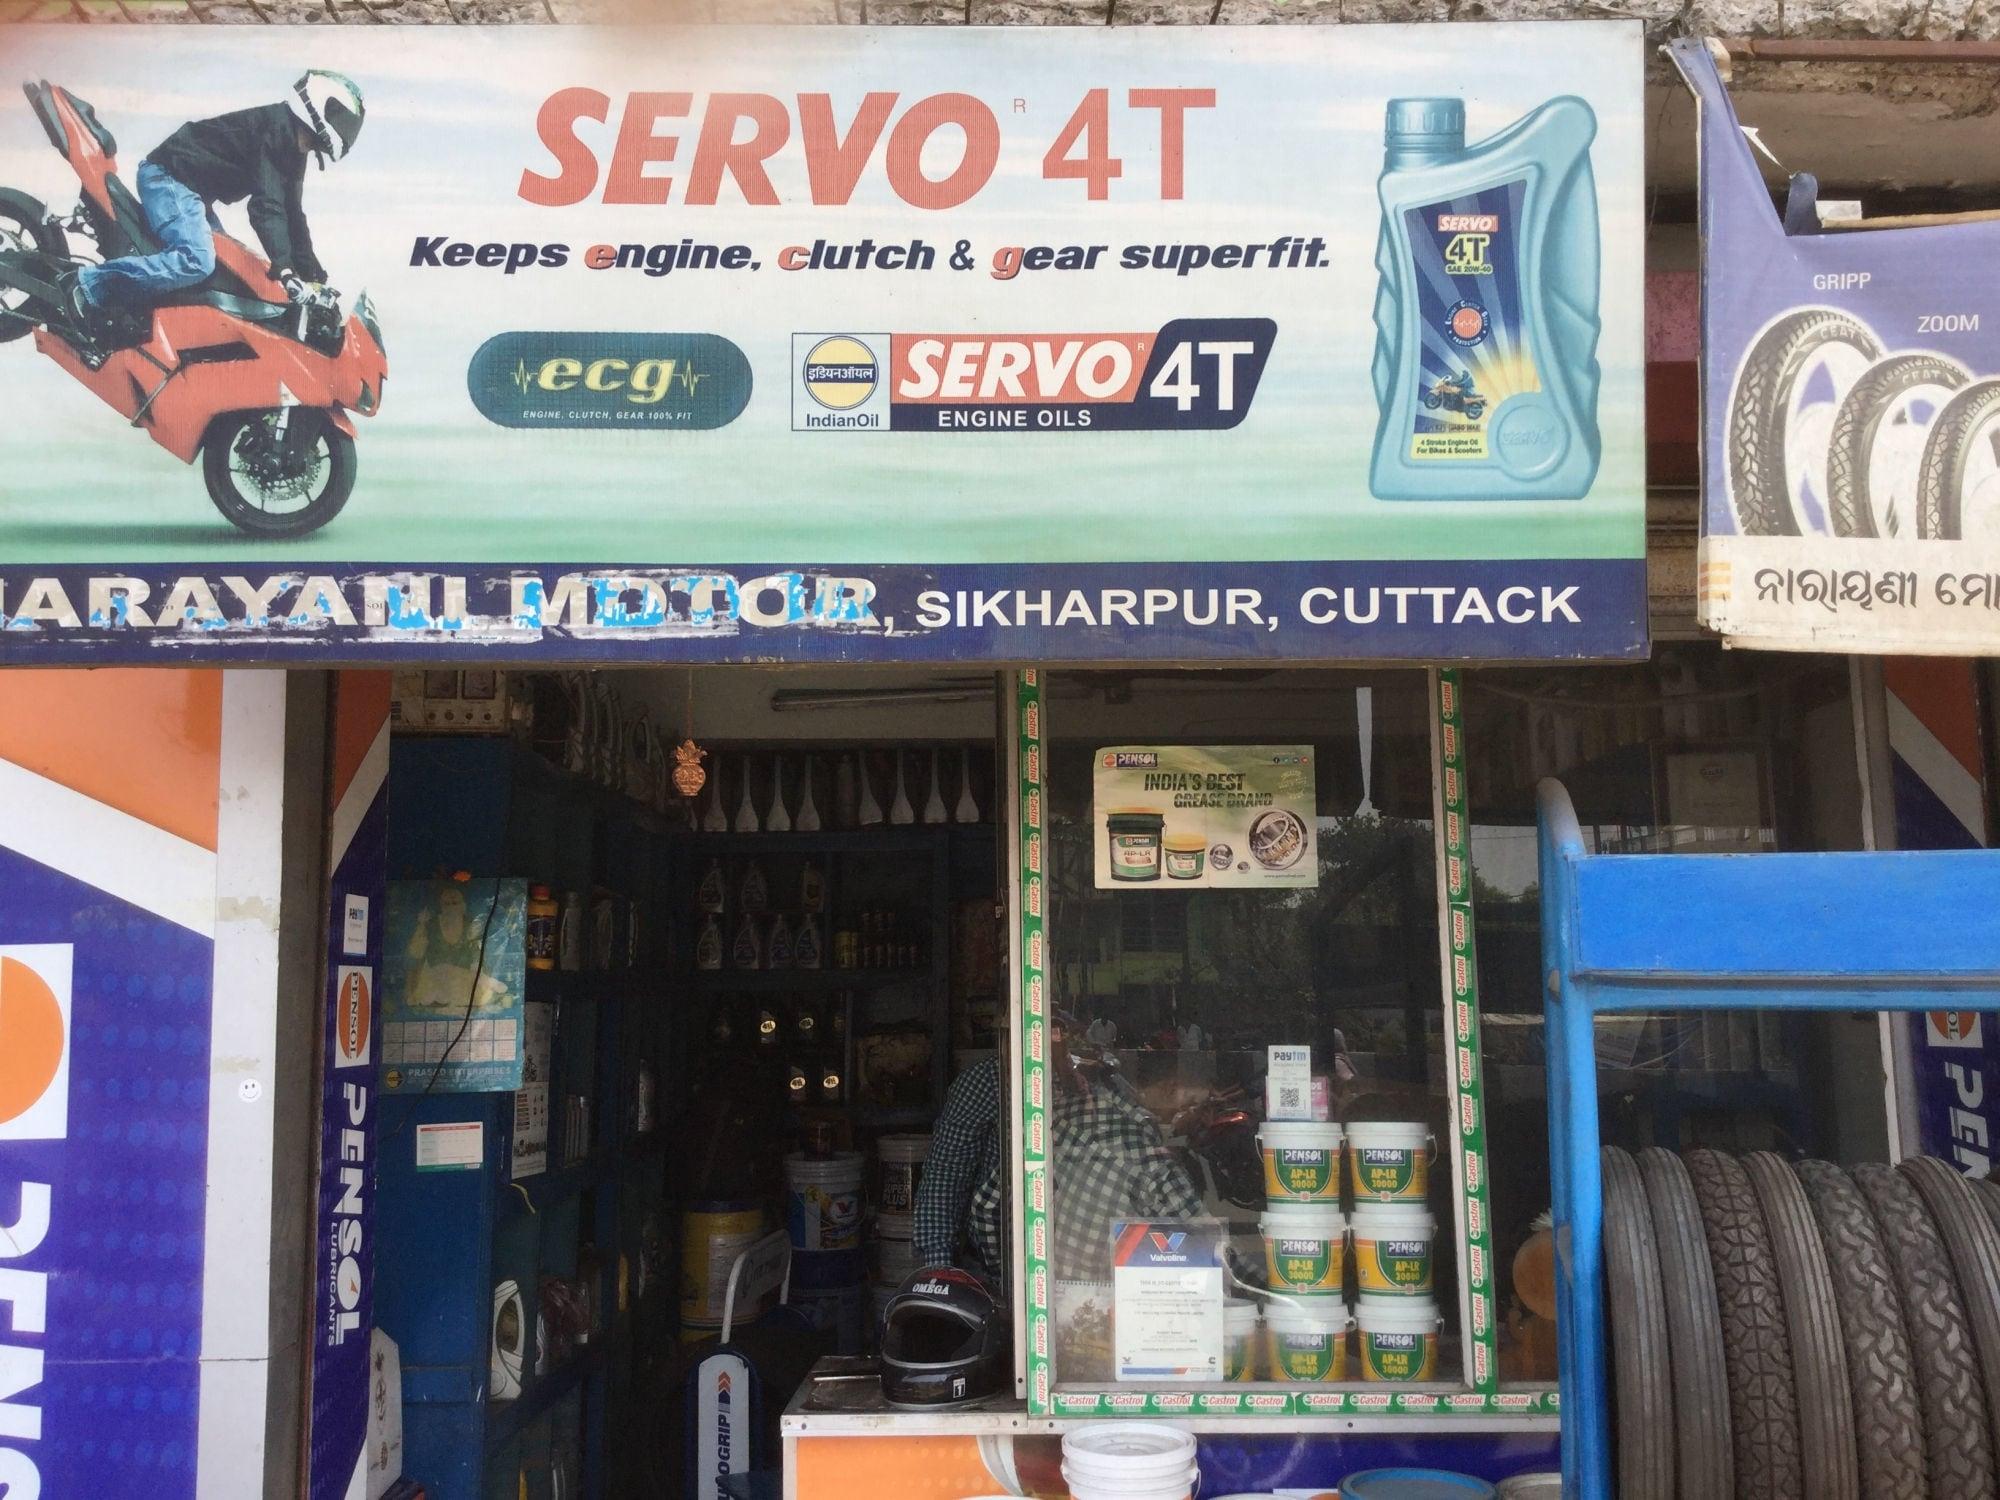 Top 10 HP Lubricant Oil Dealers in Sikharpur - Best